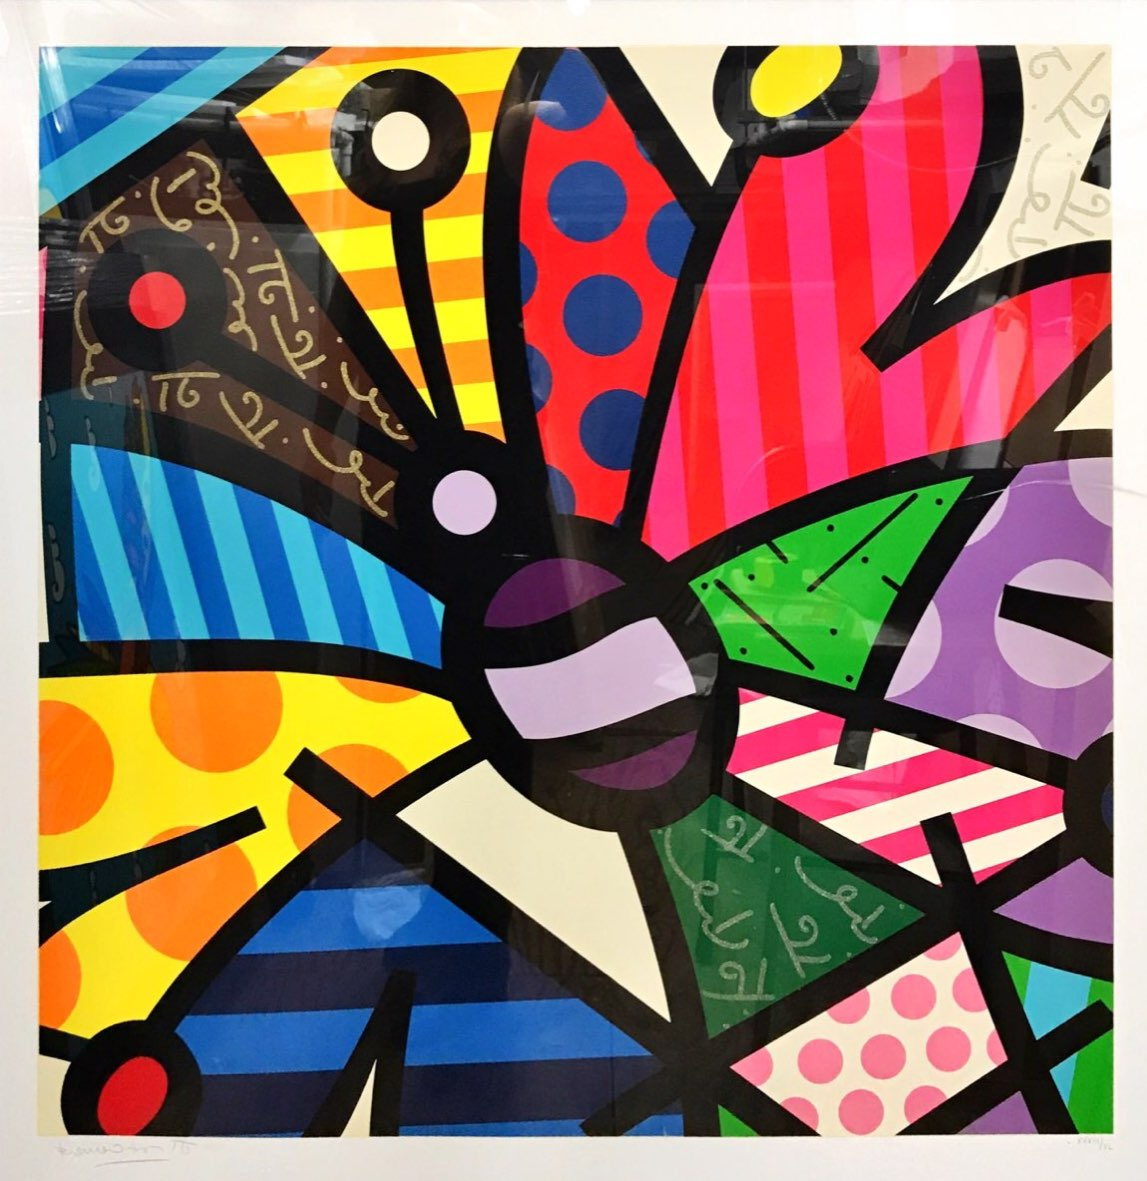 Rothchild Butterfly